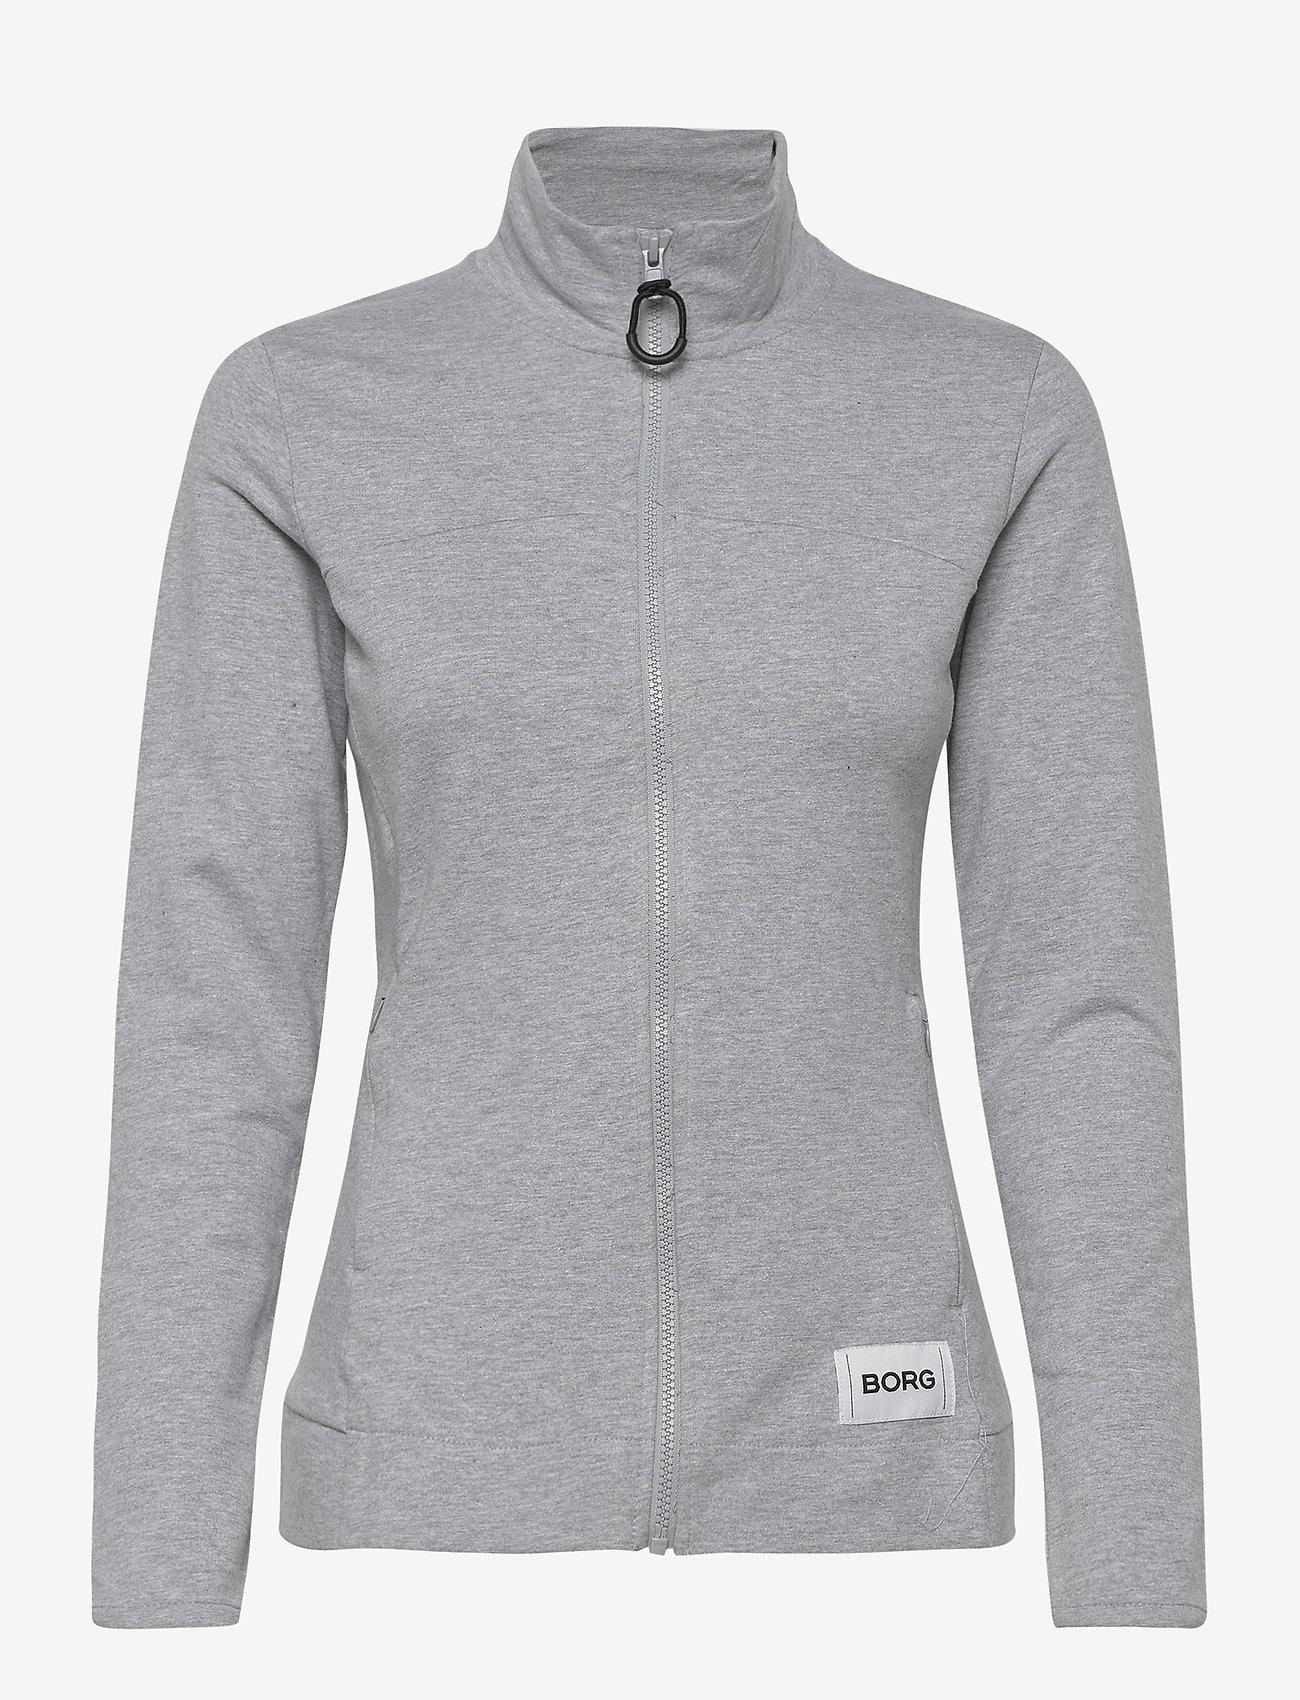 Björn Borg - JACKET FLAVIA FLAVIA - sweatshirts - h108by light grey melange - 0